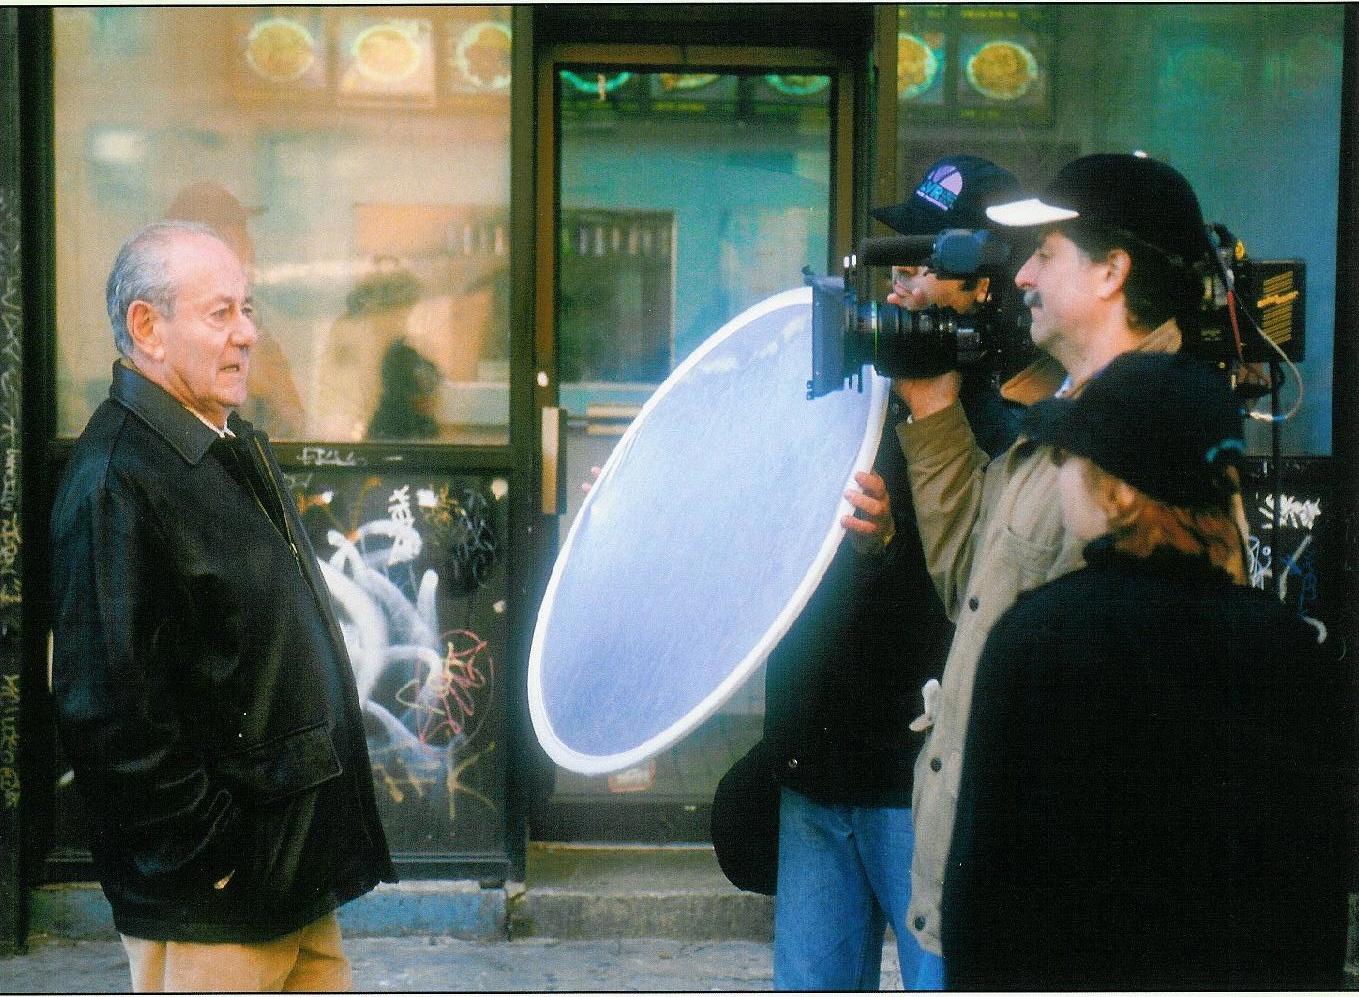 Director of Photography Dejan Georgevich and director Nina Rosenblum filming Walter Rosenblum